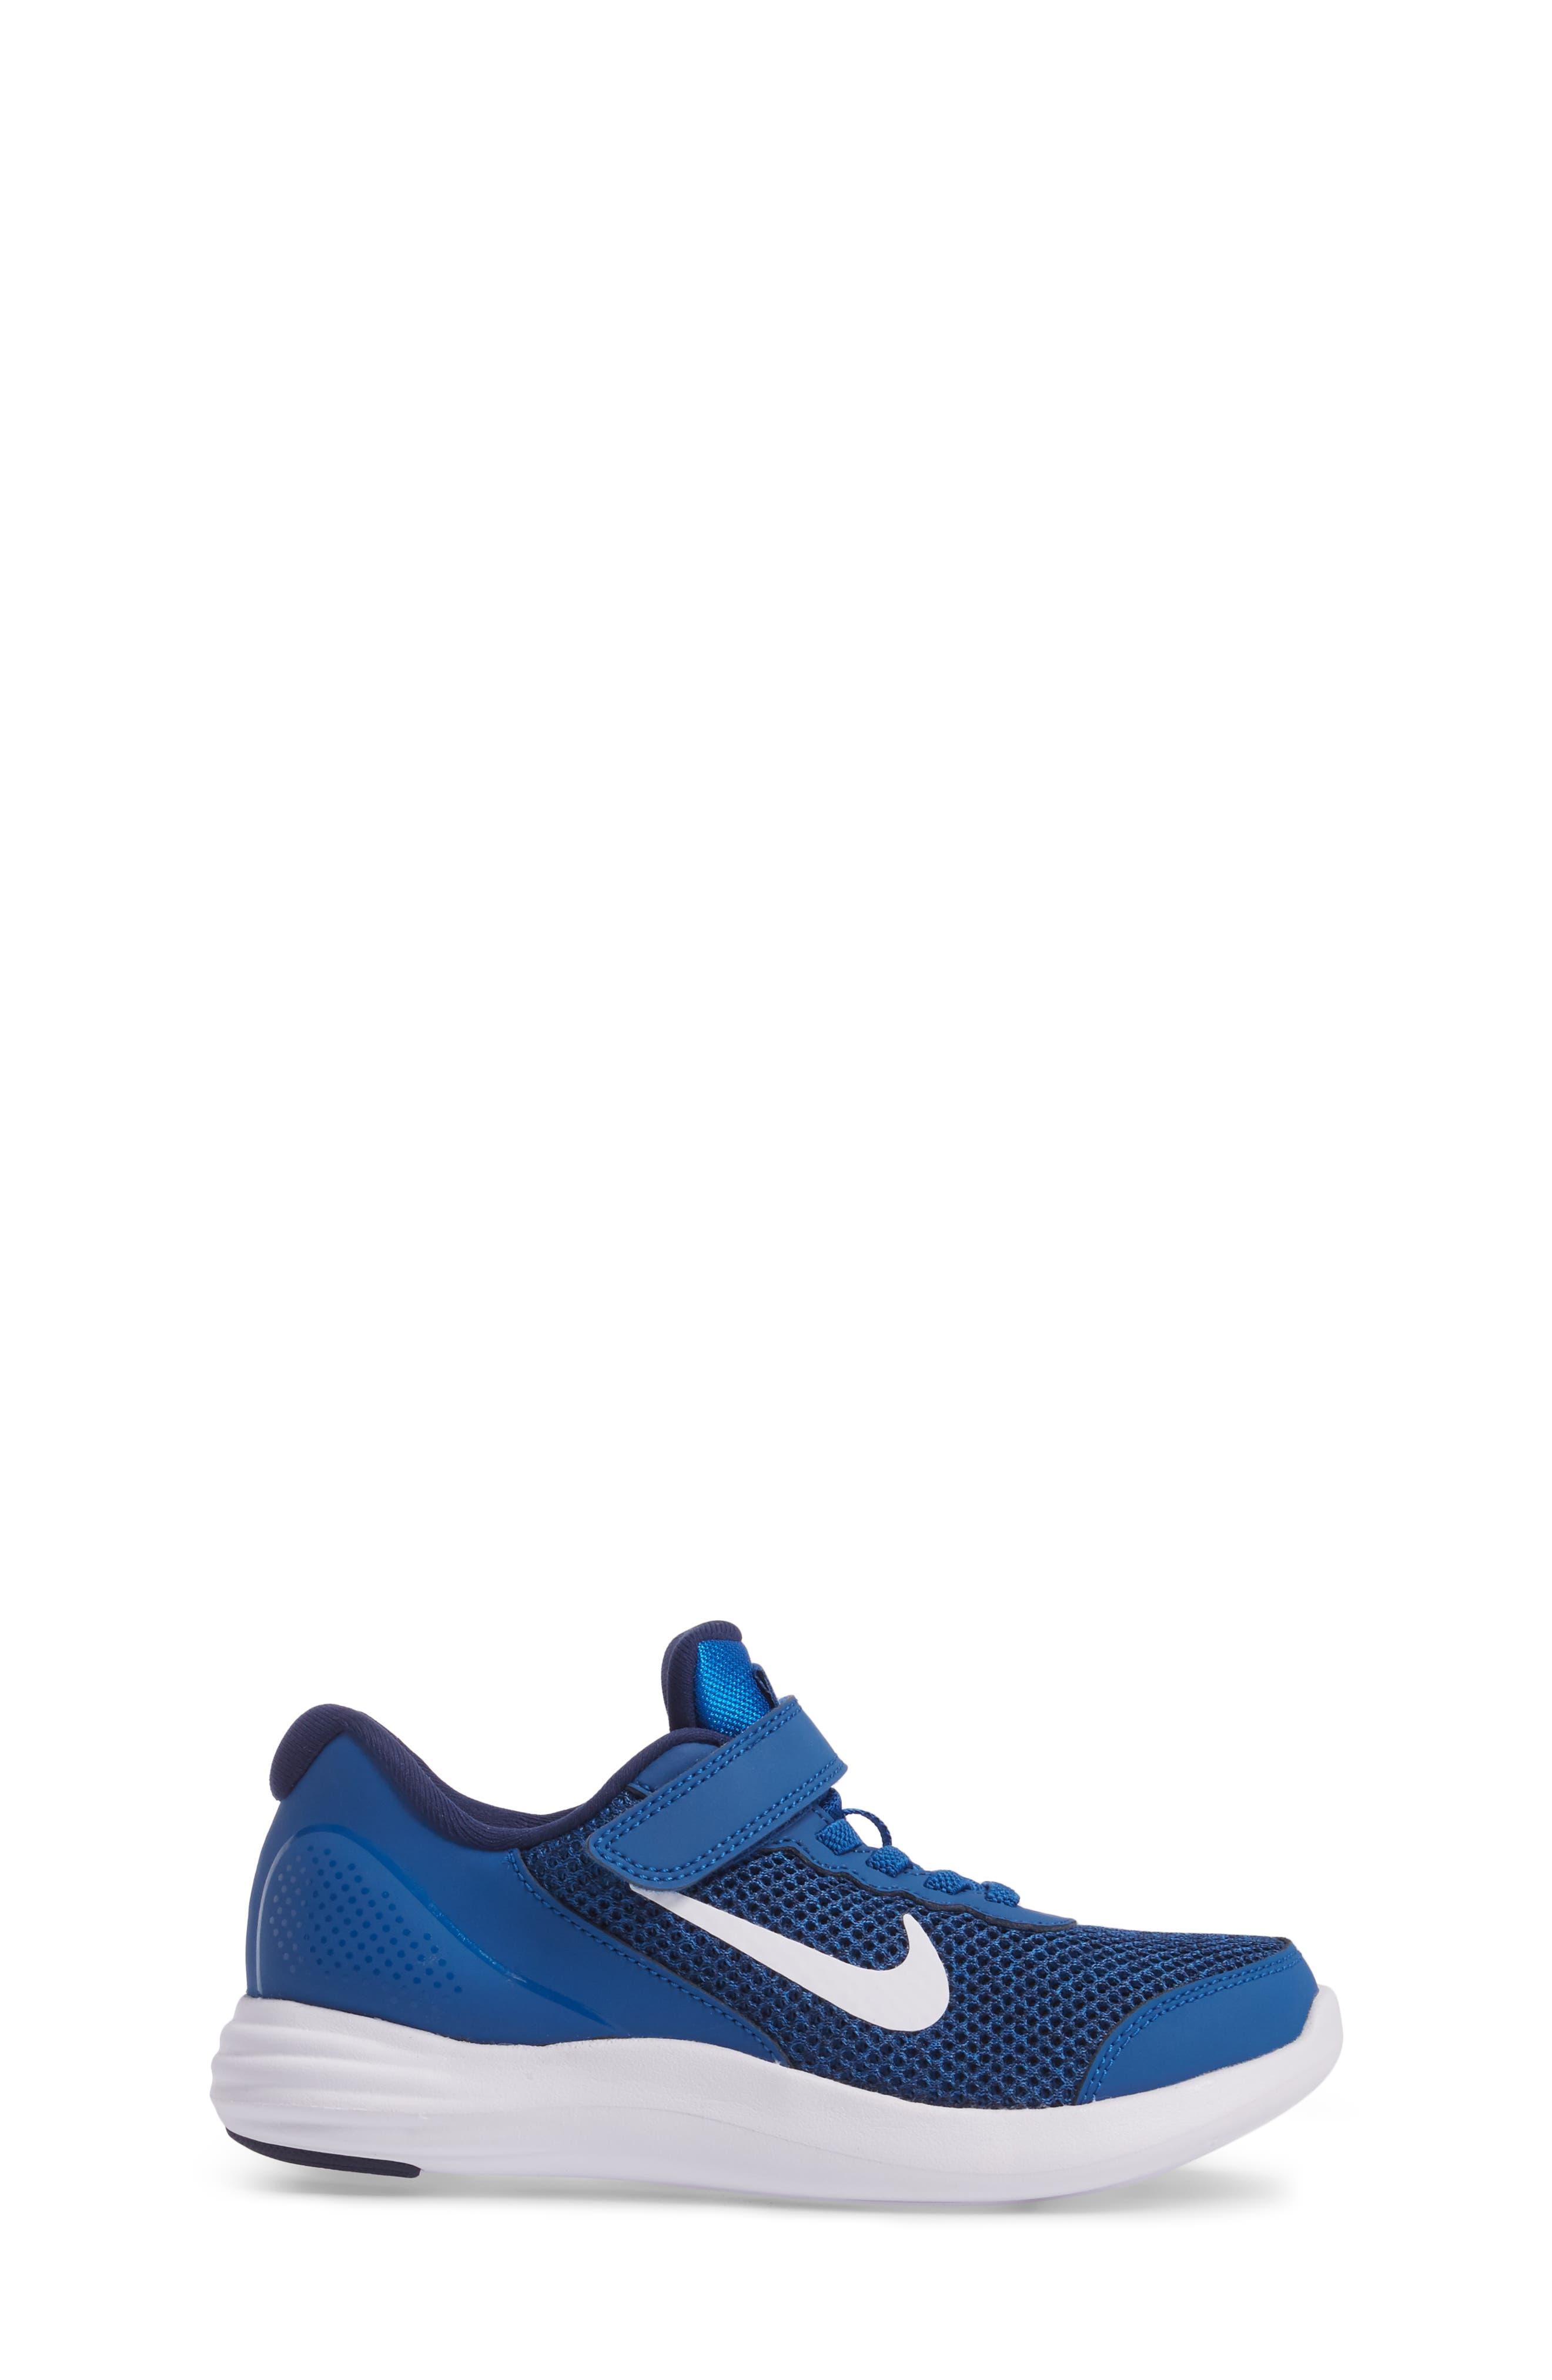 Lunar Apparent Sneaker,                             Alternate thumbnail 3, color,                             Blue Jay/ White/ Binary Blue